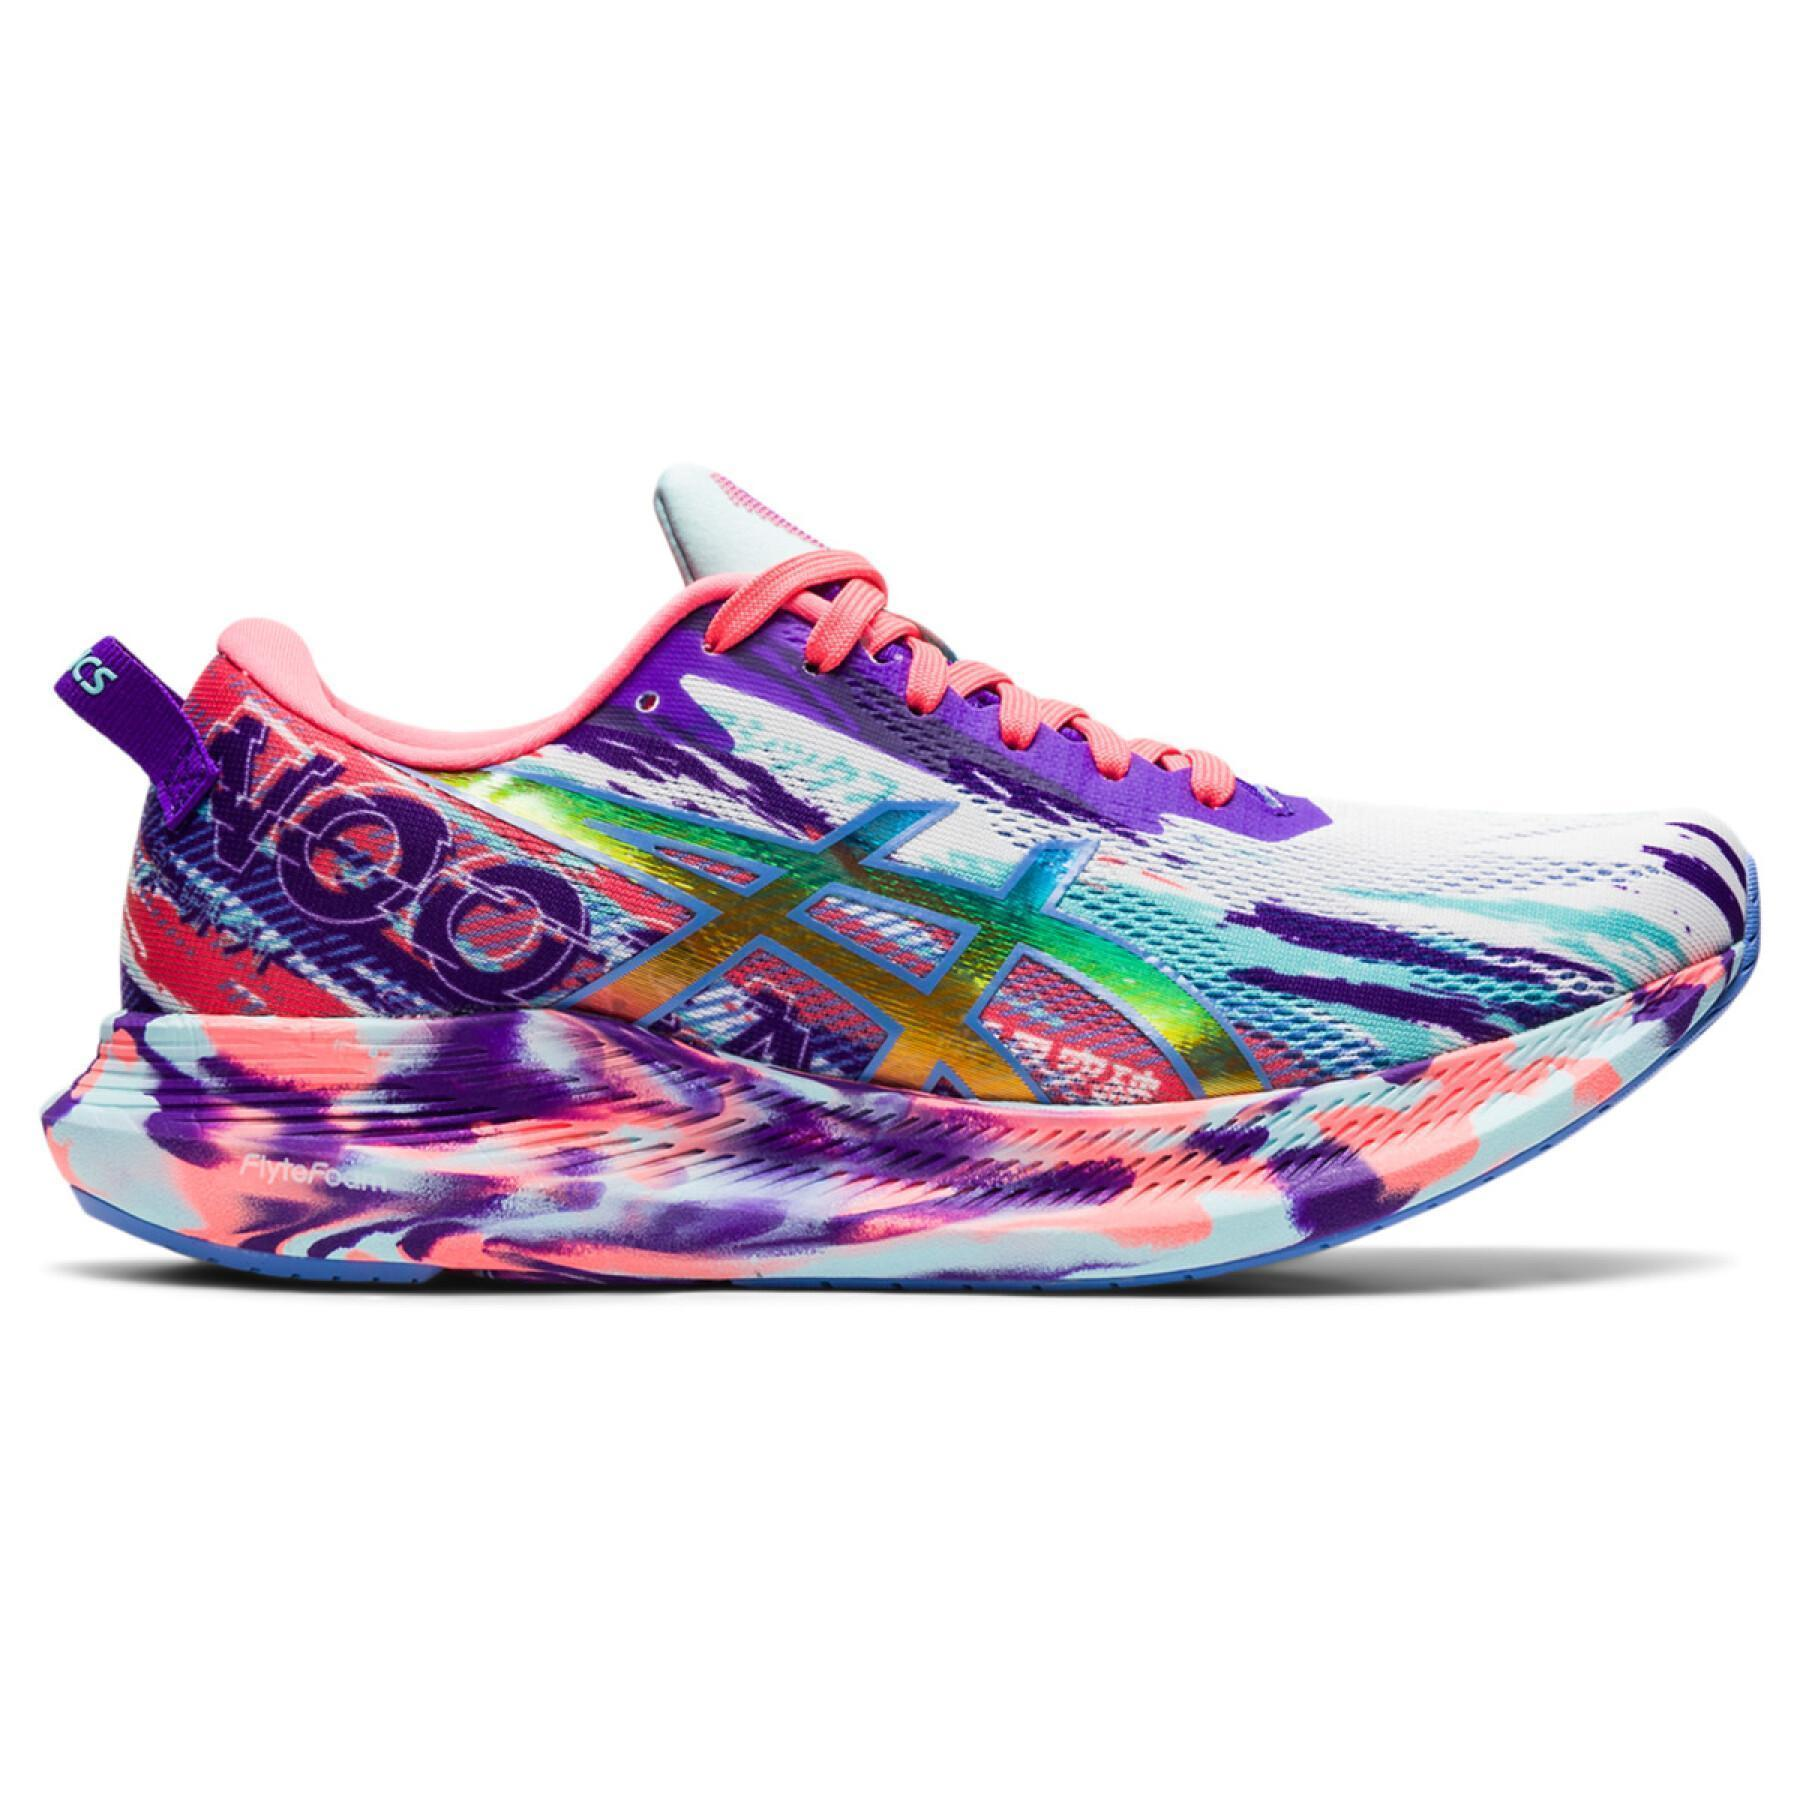 Chaussures femme Asics Noosa Tri 13